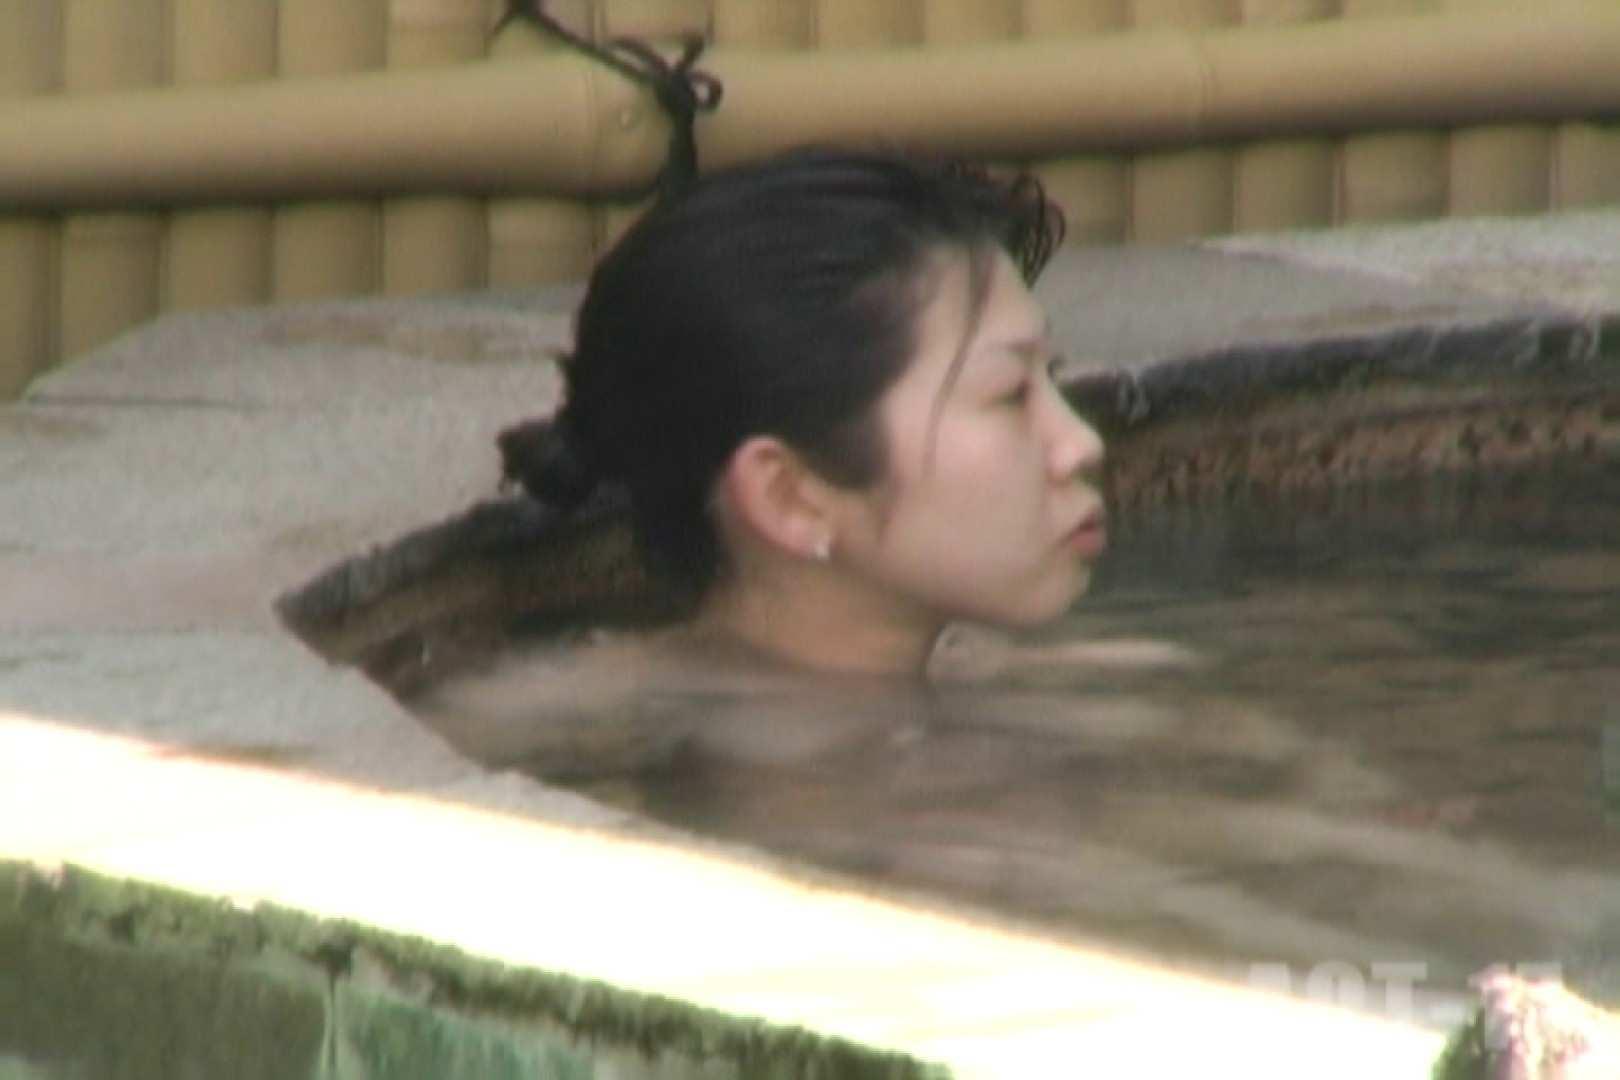 Aquaな露天風呂Vol.850 露天 | HなOL  79pic 67